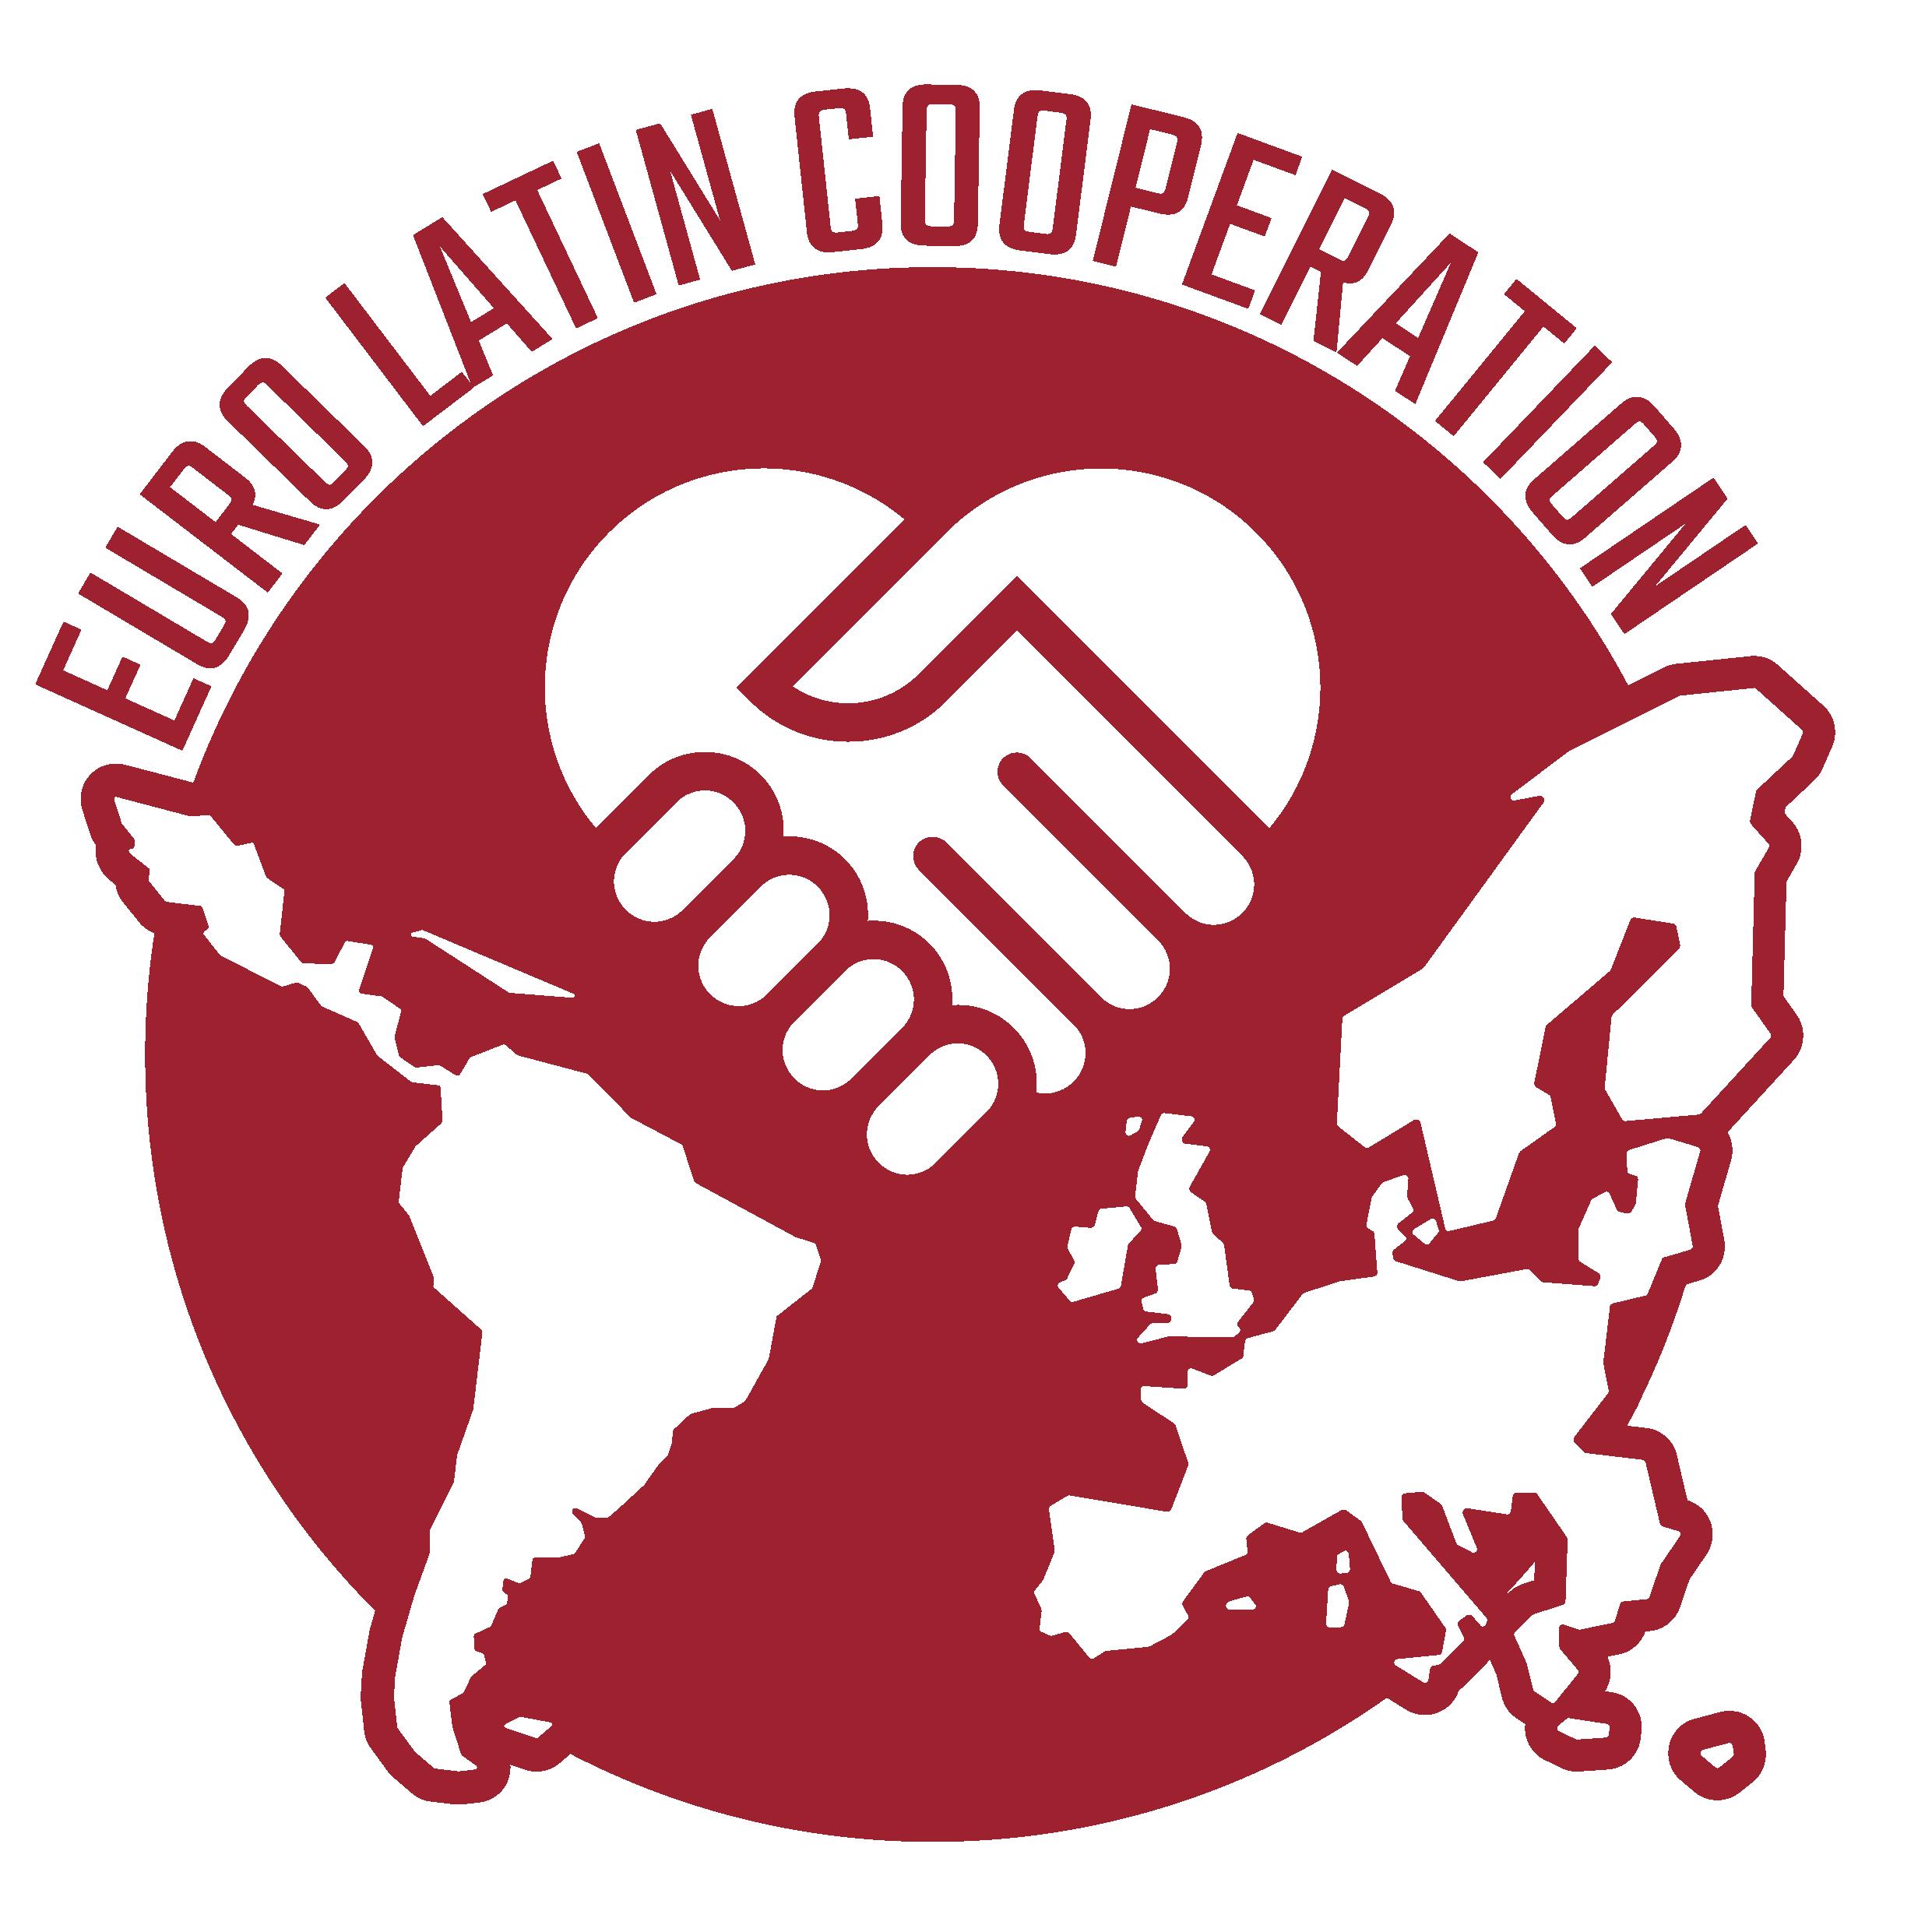 Euro-Latin Cooperation Logo